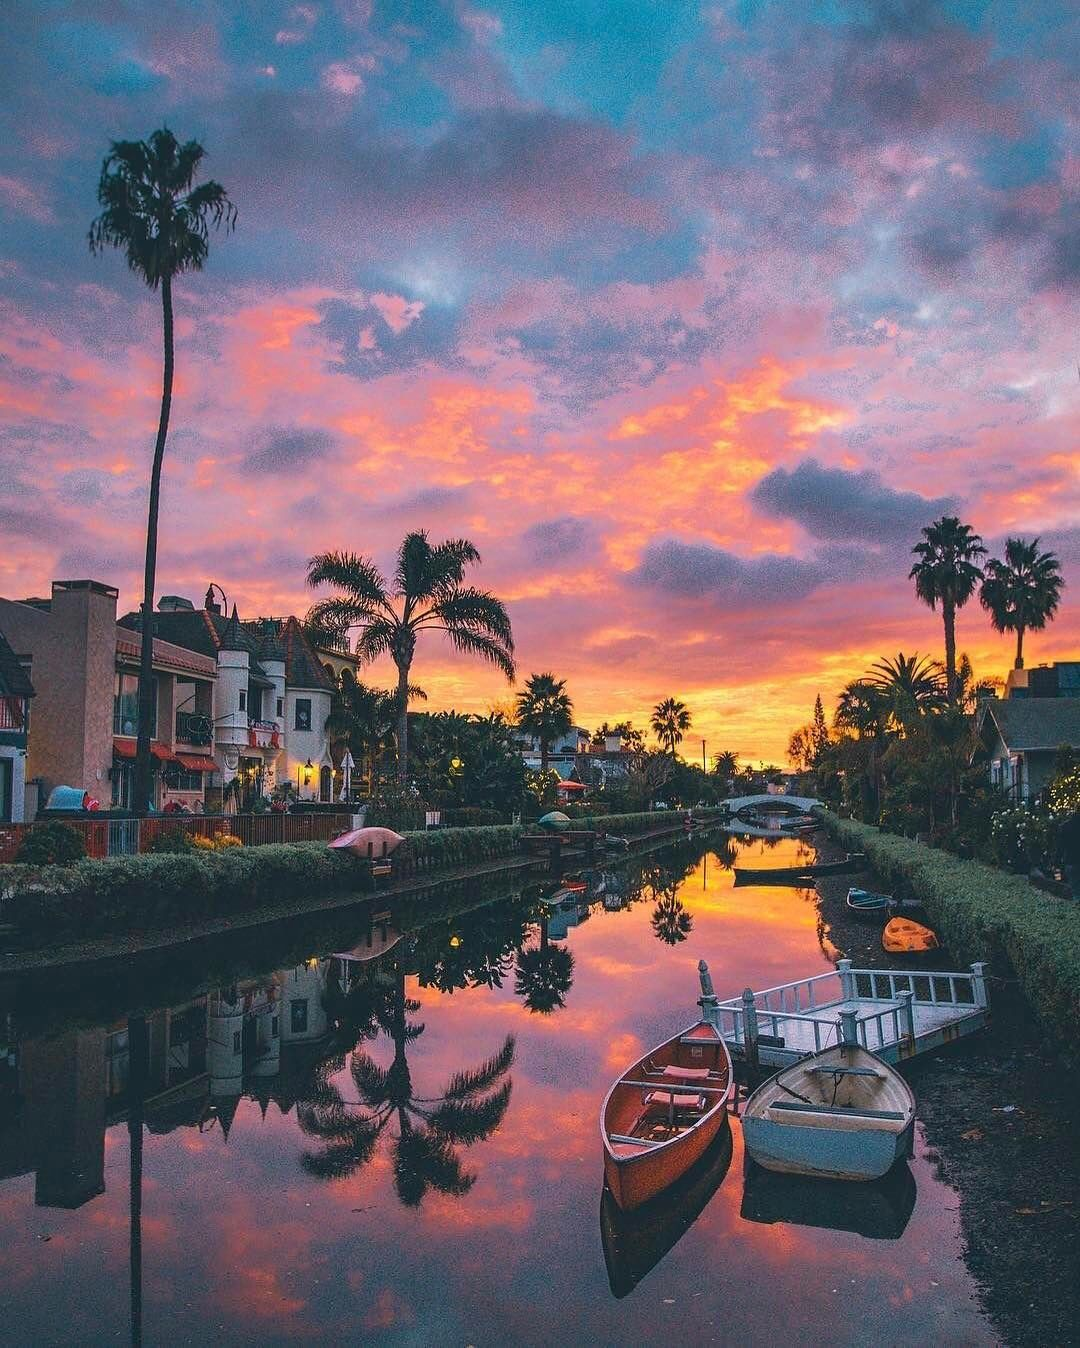 25 Best Instagram Spots In Los Angeles Local Adventurer Travel Adventures In Portland World Wide California Travel Venice Beach Canals Travel Usa